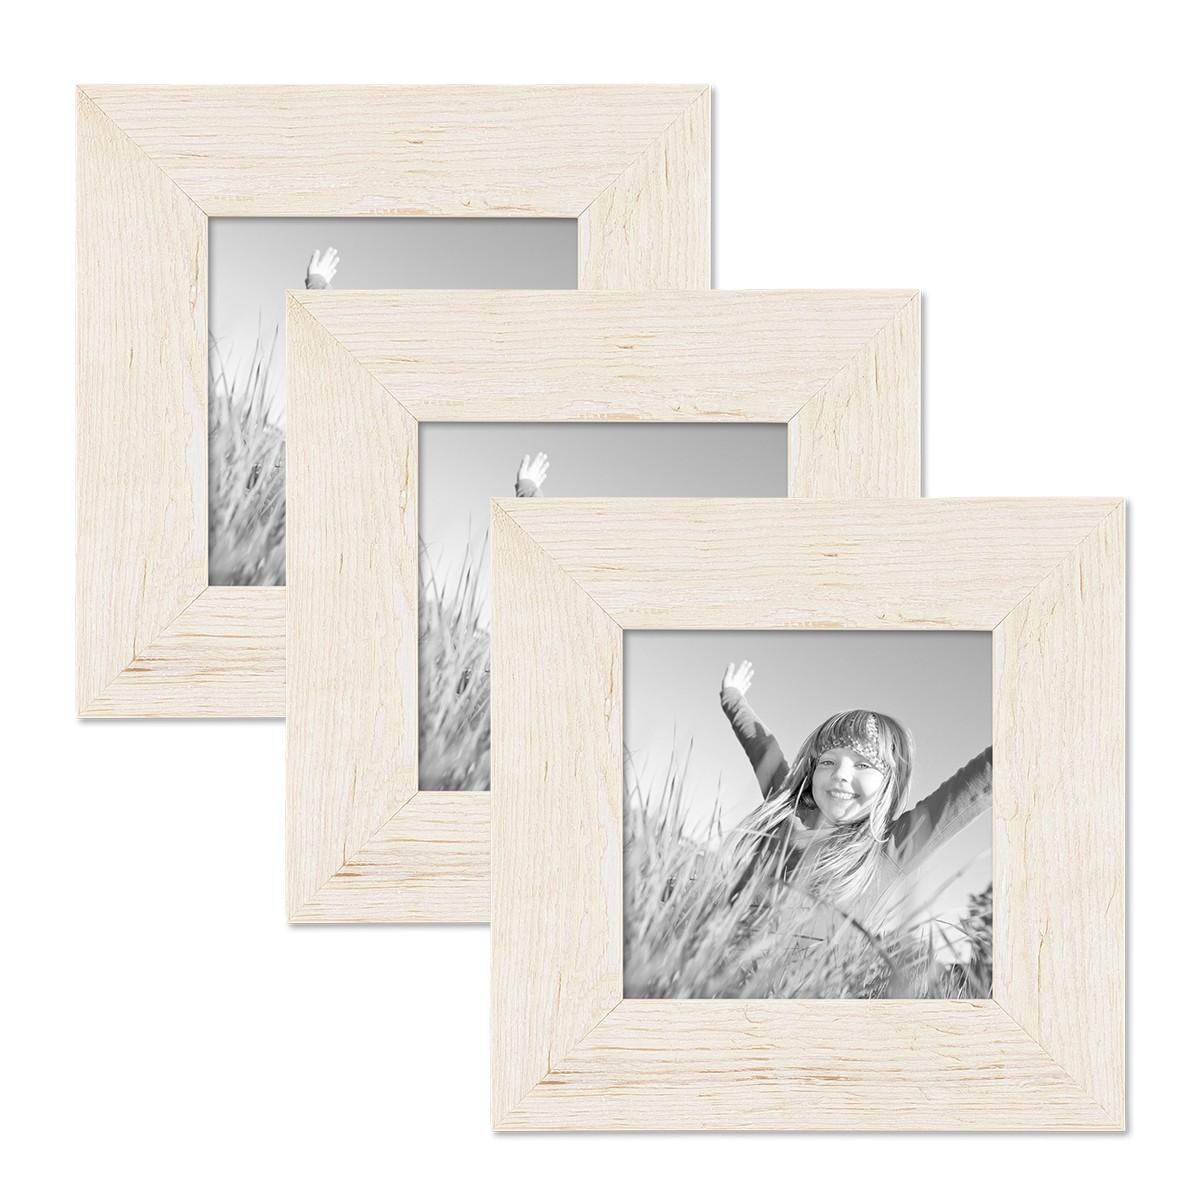 3er bilderrahmen set 10x10 cm strandhaus rustikal weiss massivholz mit glasscheibe inkl zubeh r. Black Bedroom Furniture Sets. Home Design Ideas